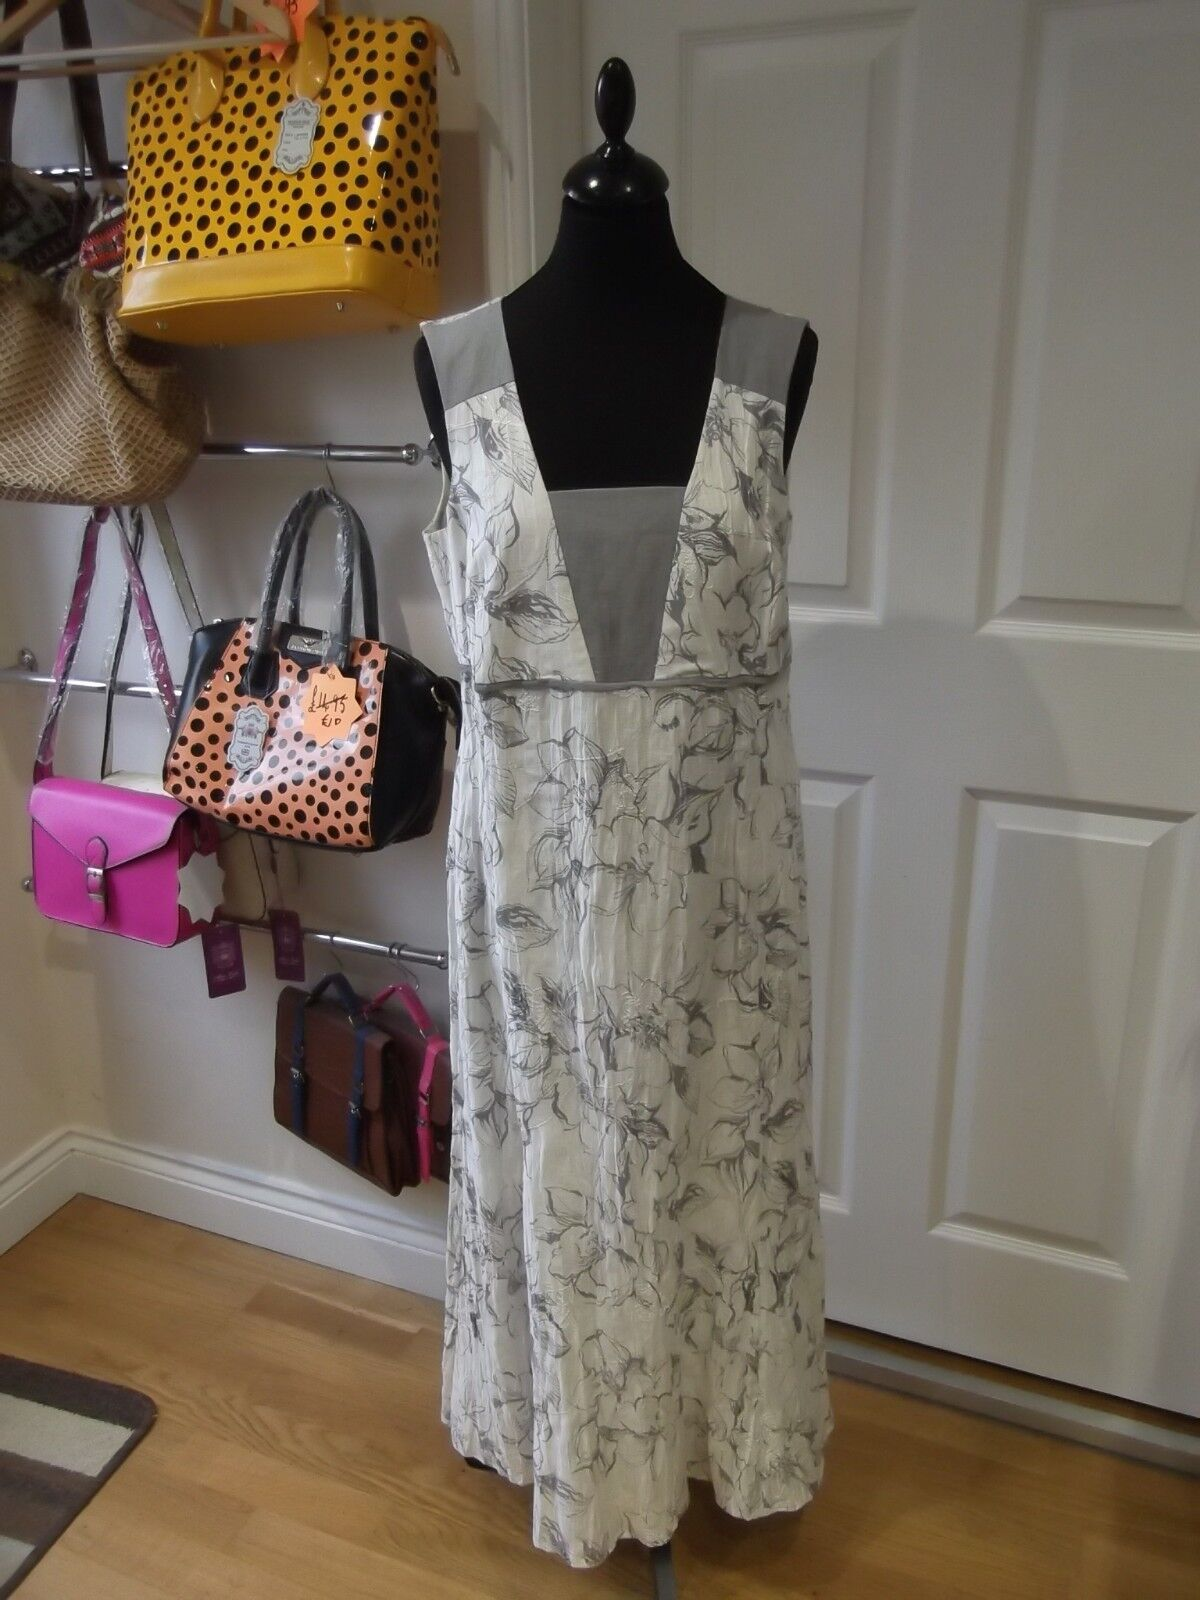 KIRSTEN KROG DESIGN Dress White Grey Floral Print Occasion Wear UK Size 14